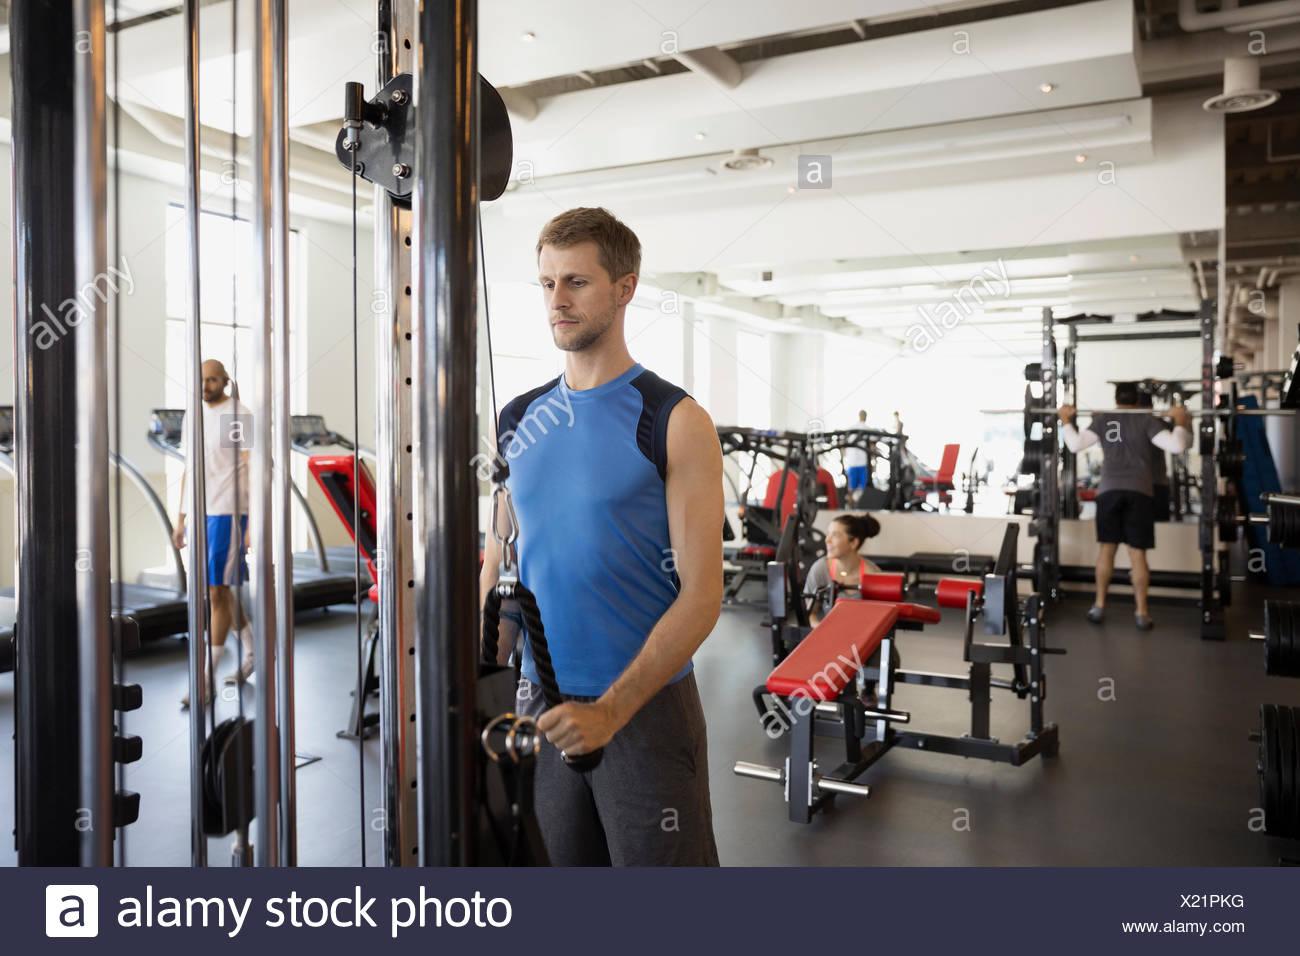 Triceps Rope Pulldown Imágenes De Stock & Triceps Rope Pulldown ...